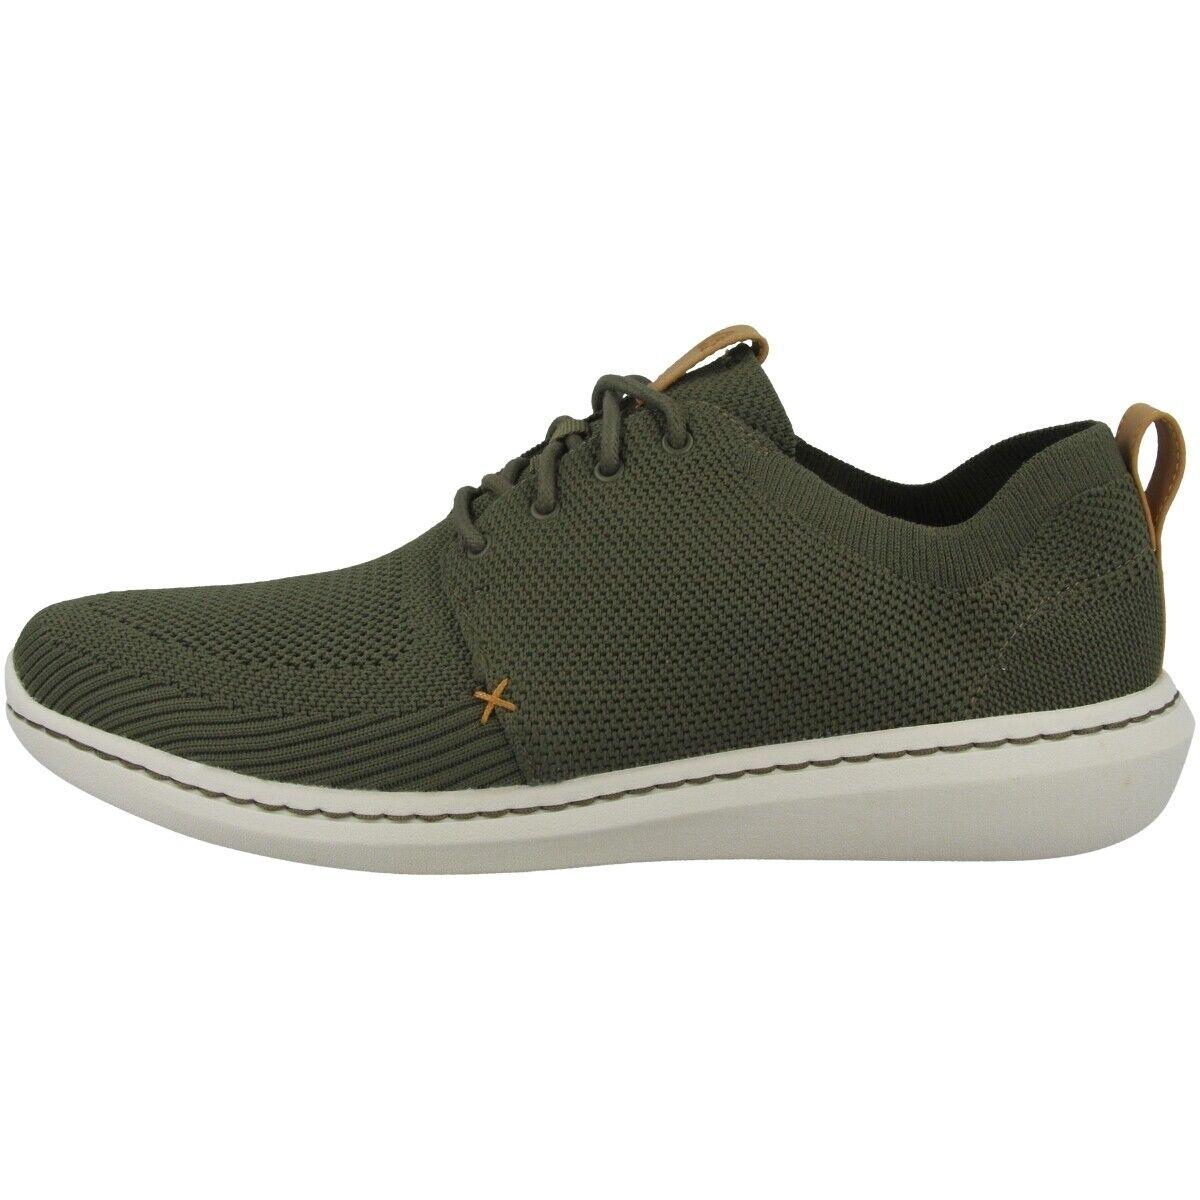 0c132588188fe Clarks Step Urban Mix shoes men shoes da Ginnastica shoes con Lacci 26138174